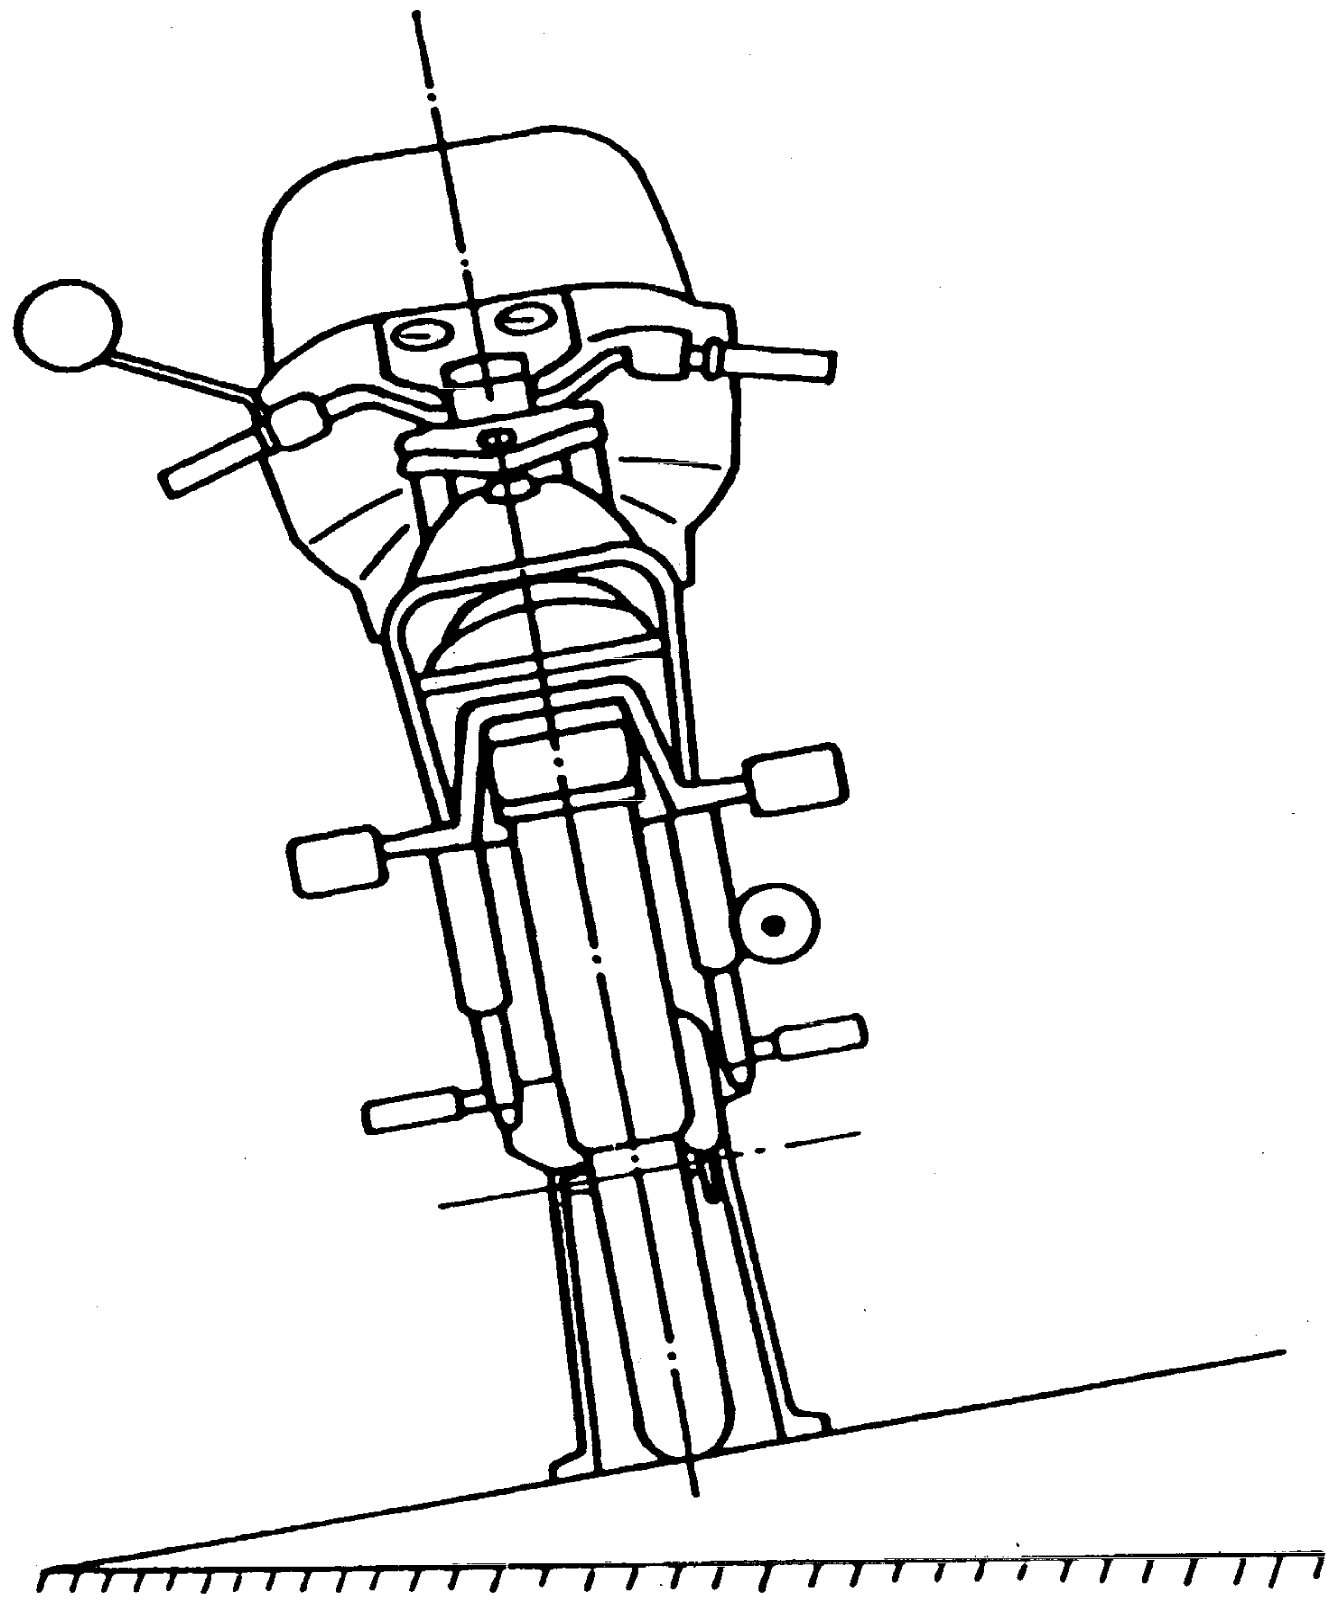 Eur Lex 02014r0044 20161016 En Ih 300 Utility Wiring Diagram Image